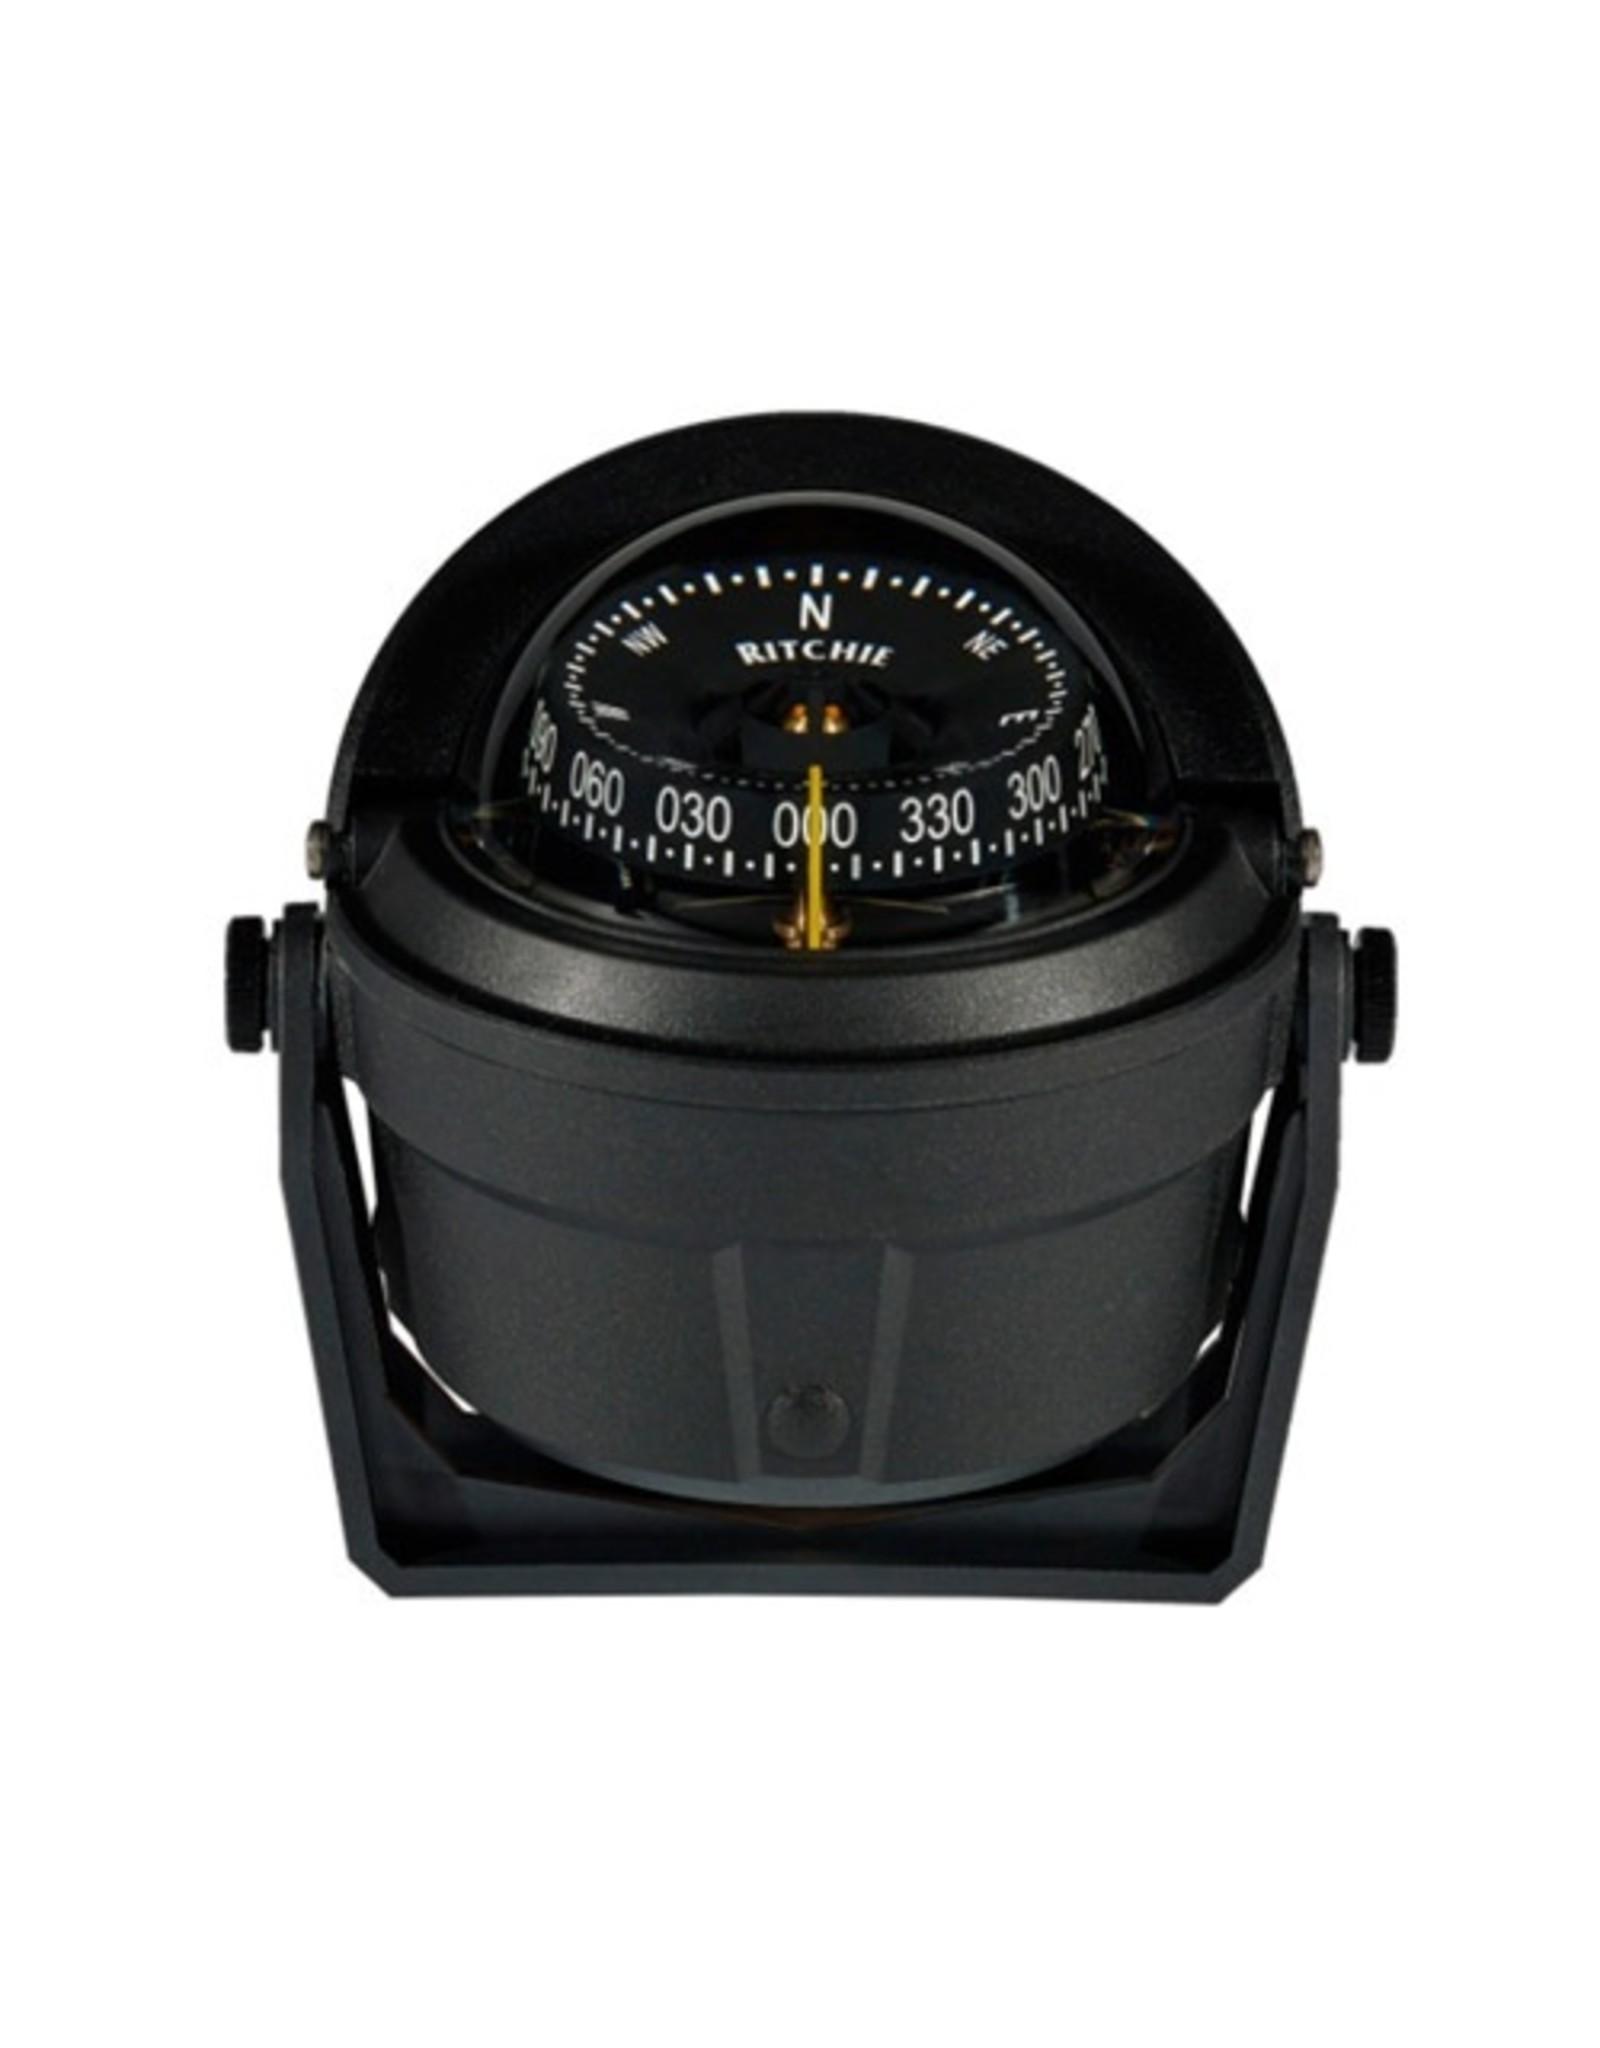 Ritchie Voyager kompas